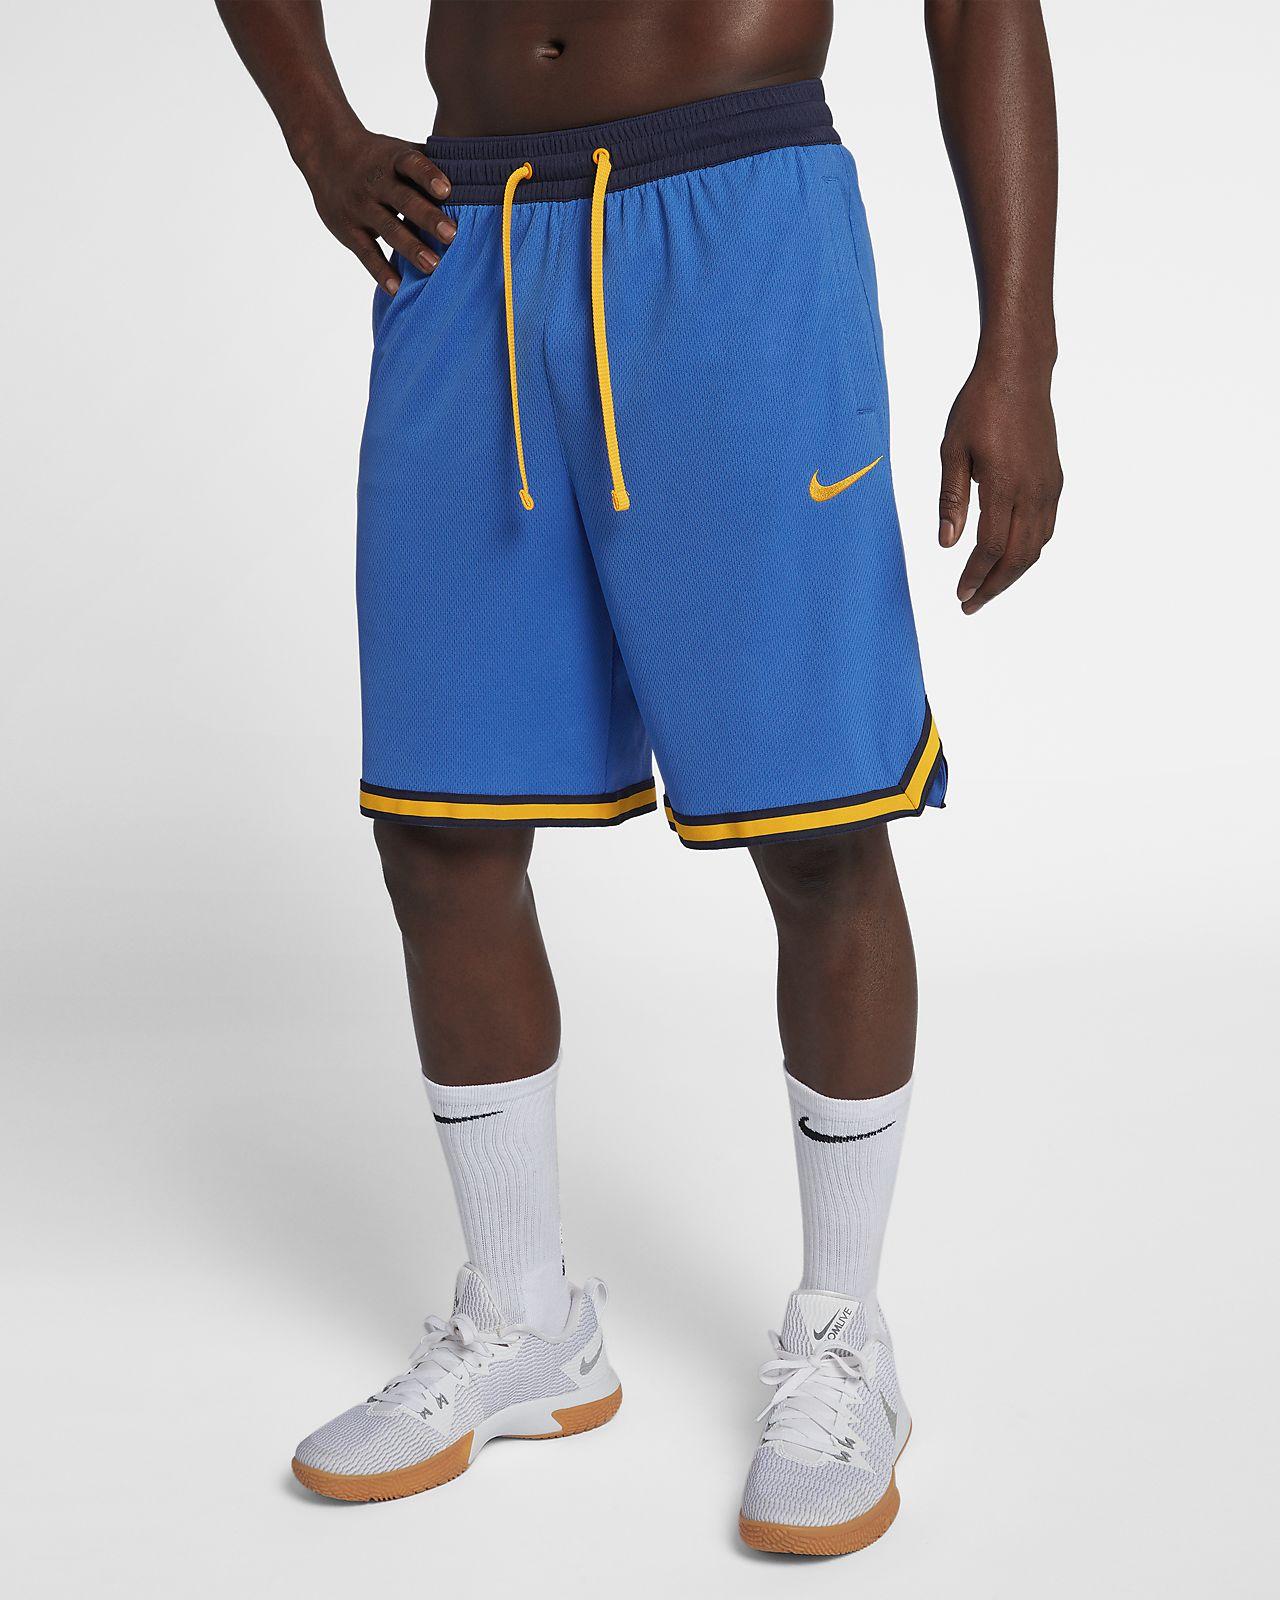 De Hombre Pantalón Baloncesto Es Nike Dri Fit Dna Corto wAUX0t